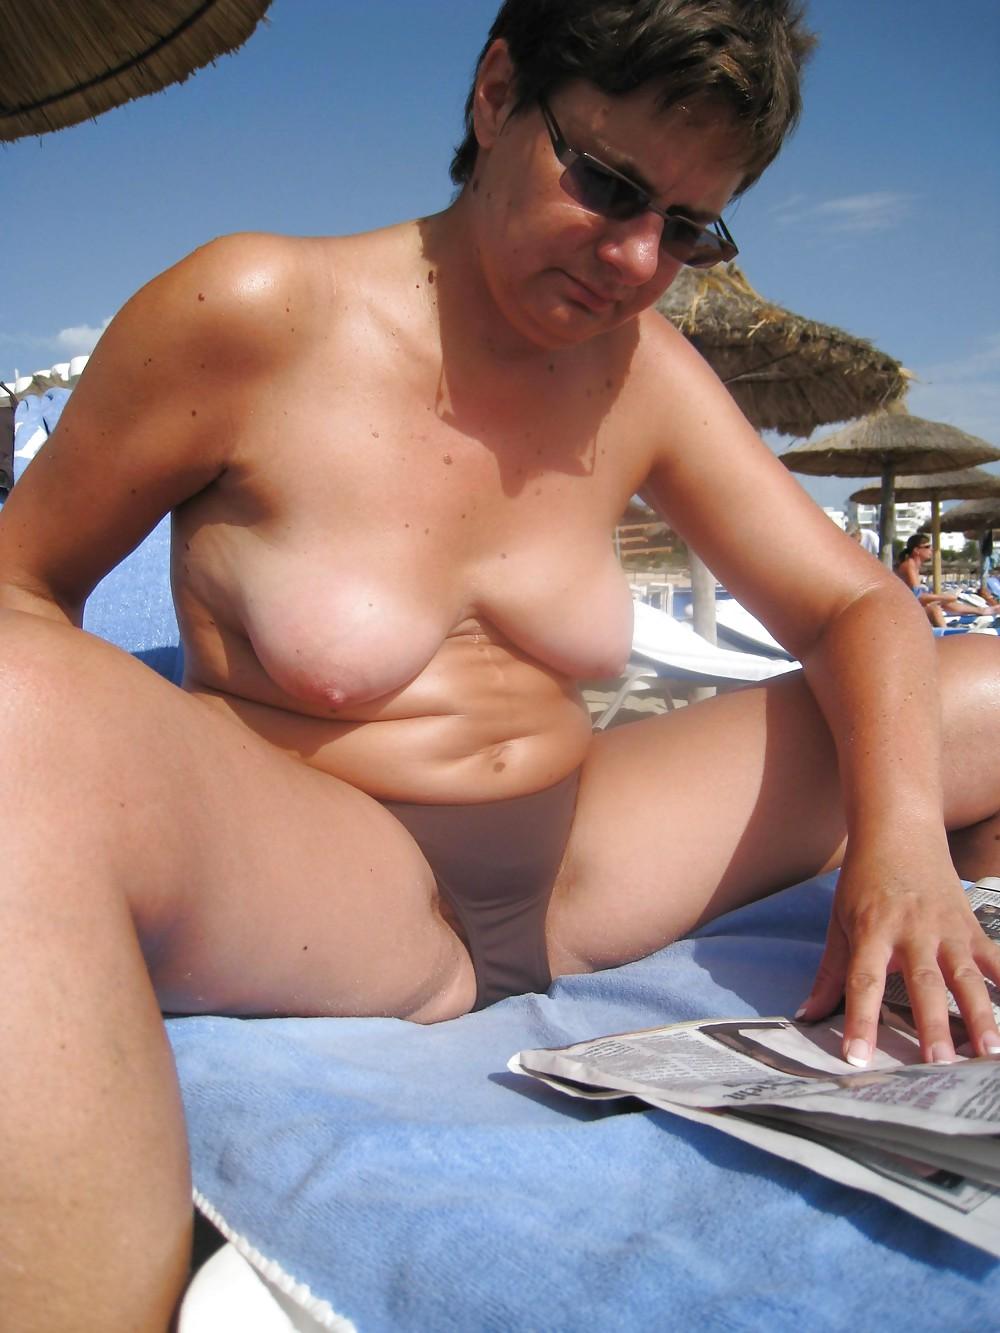 Candid mature videos, romanian naked girls